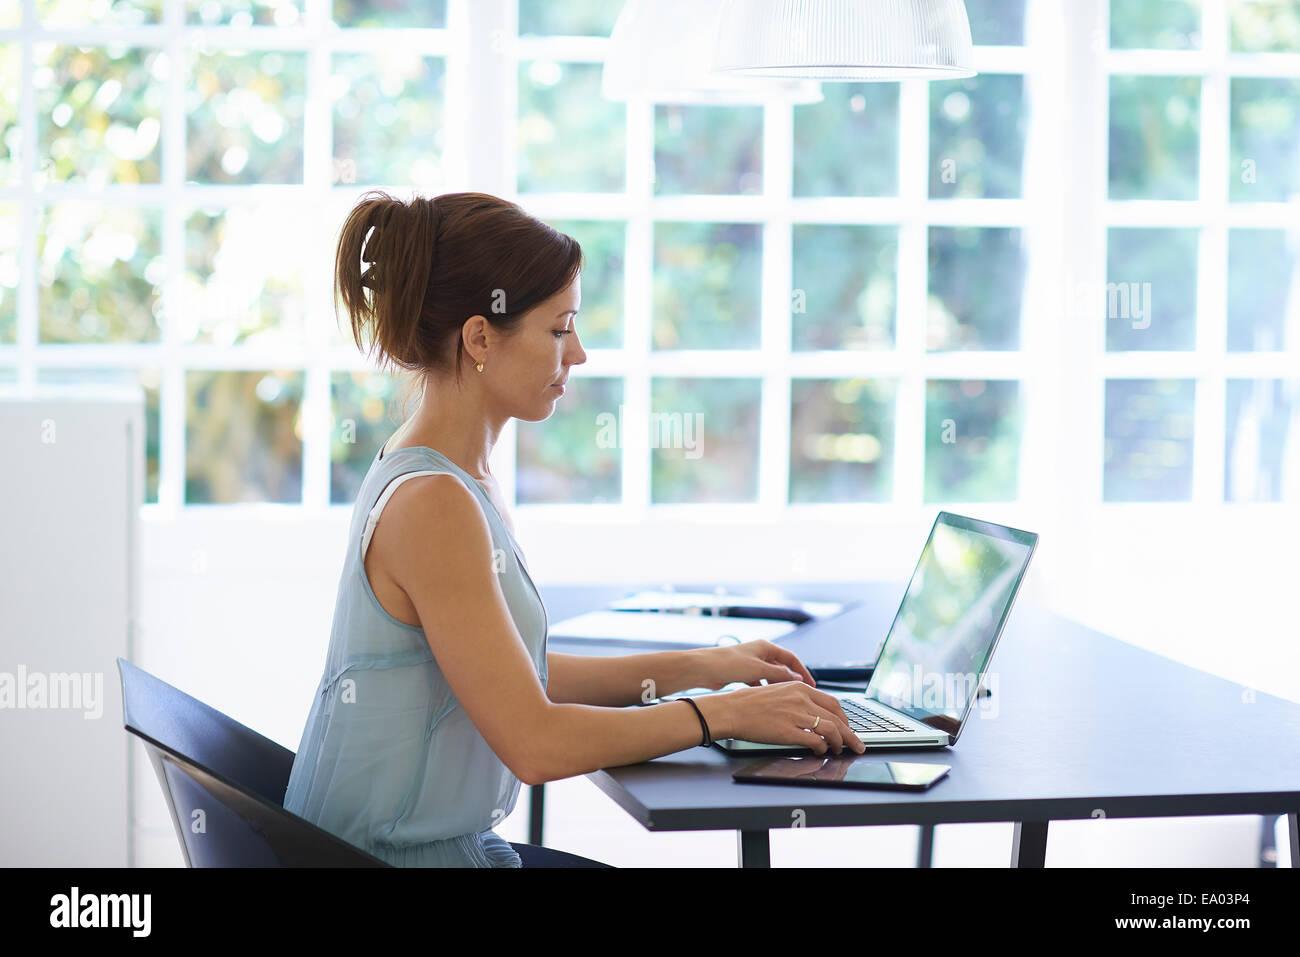 Mitte Erwachsene Frau arbeiten am Laptop im Speisesaal Stockfoto